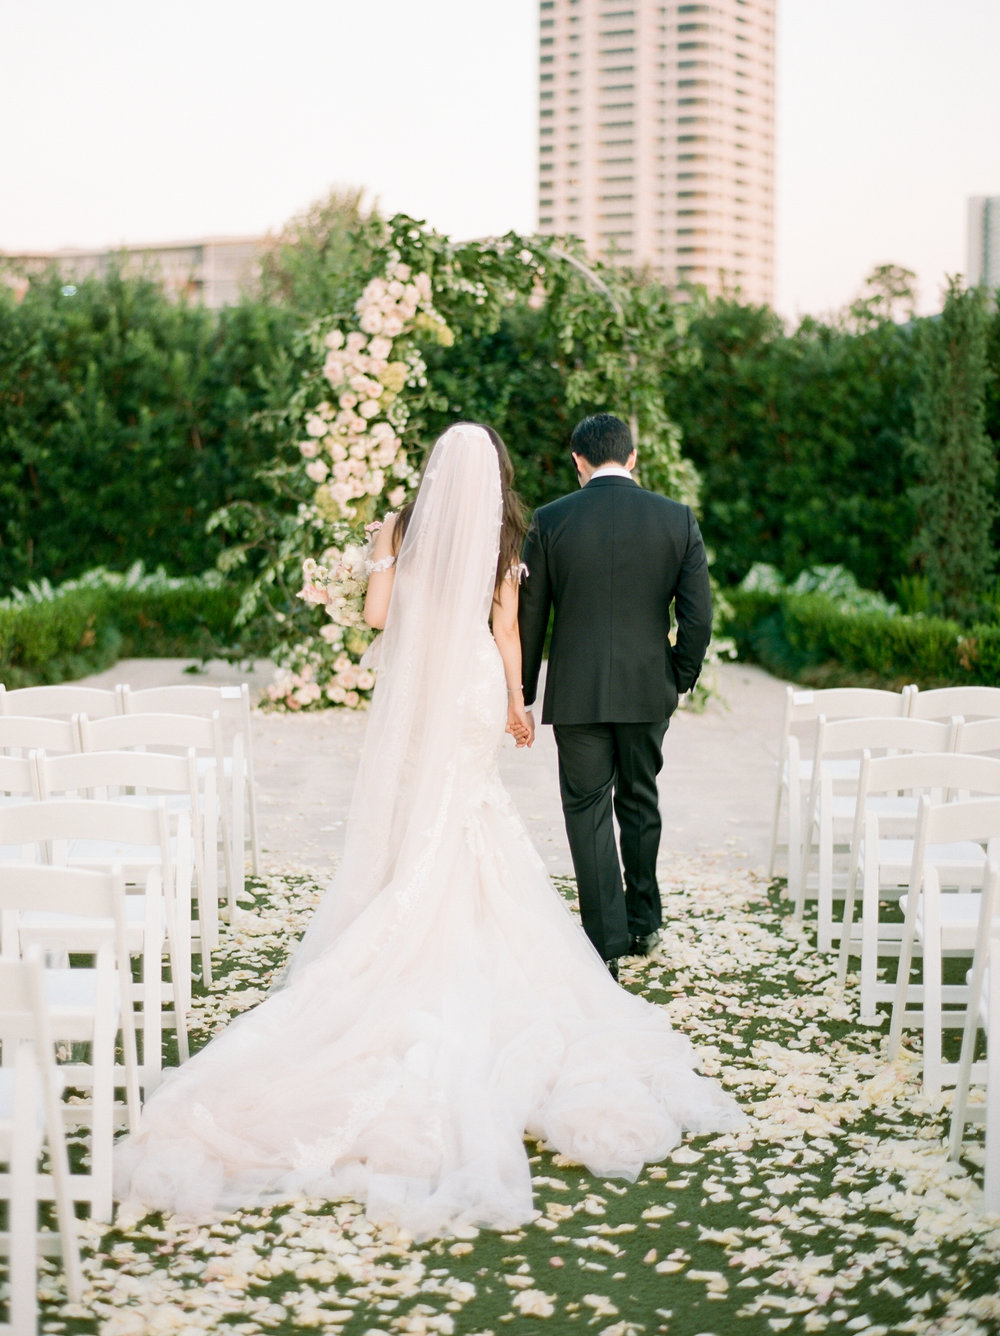 Martha-Stewart-Wedding-Dana-Fernandez-Photography-Josh-Texas-Film-Houston-Wedding-Fine-Art-Photographer-McGovern-Centennial-Gardens-Top-Best-38.jpg